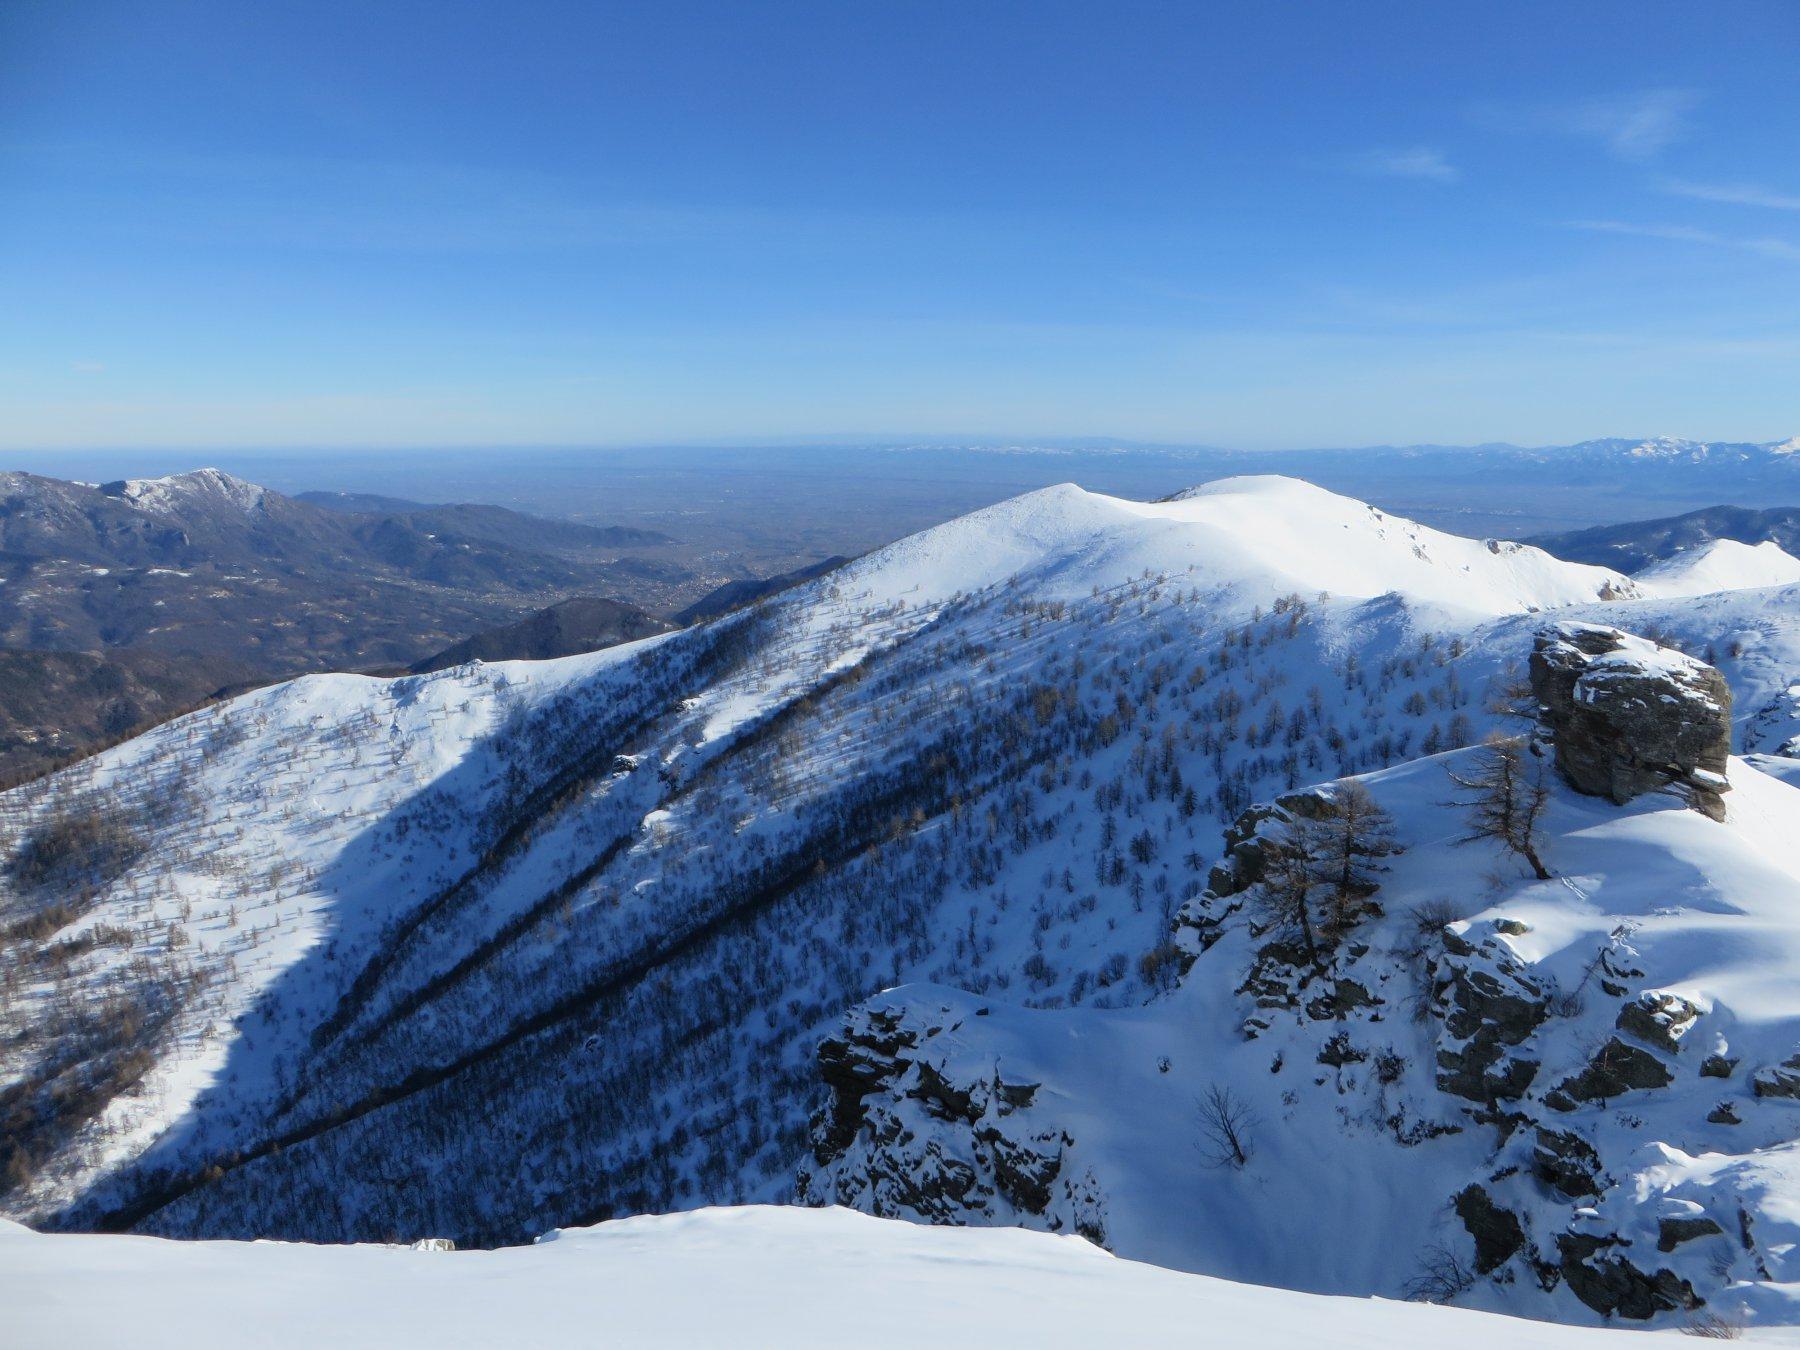 Dal Monte Plum sguardo verso valle